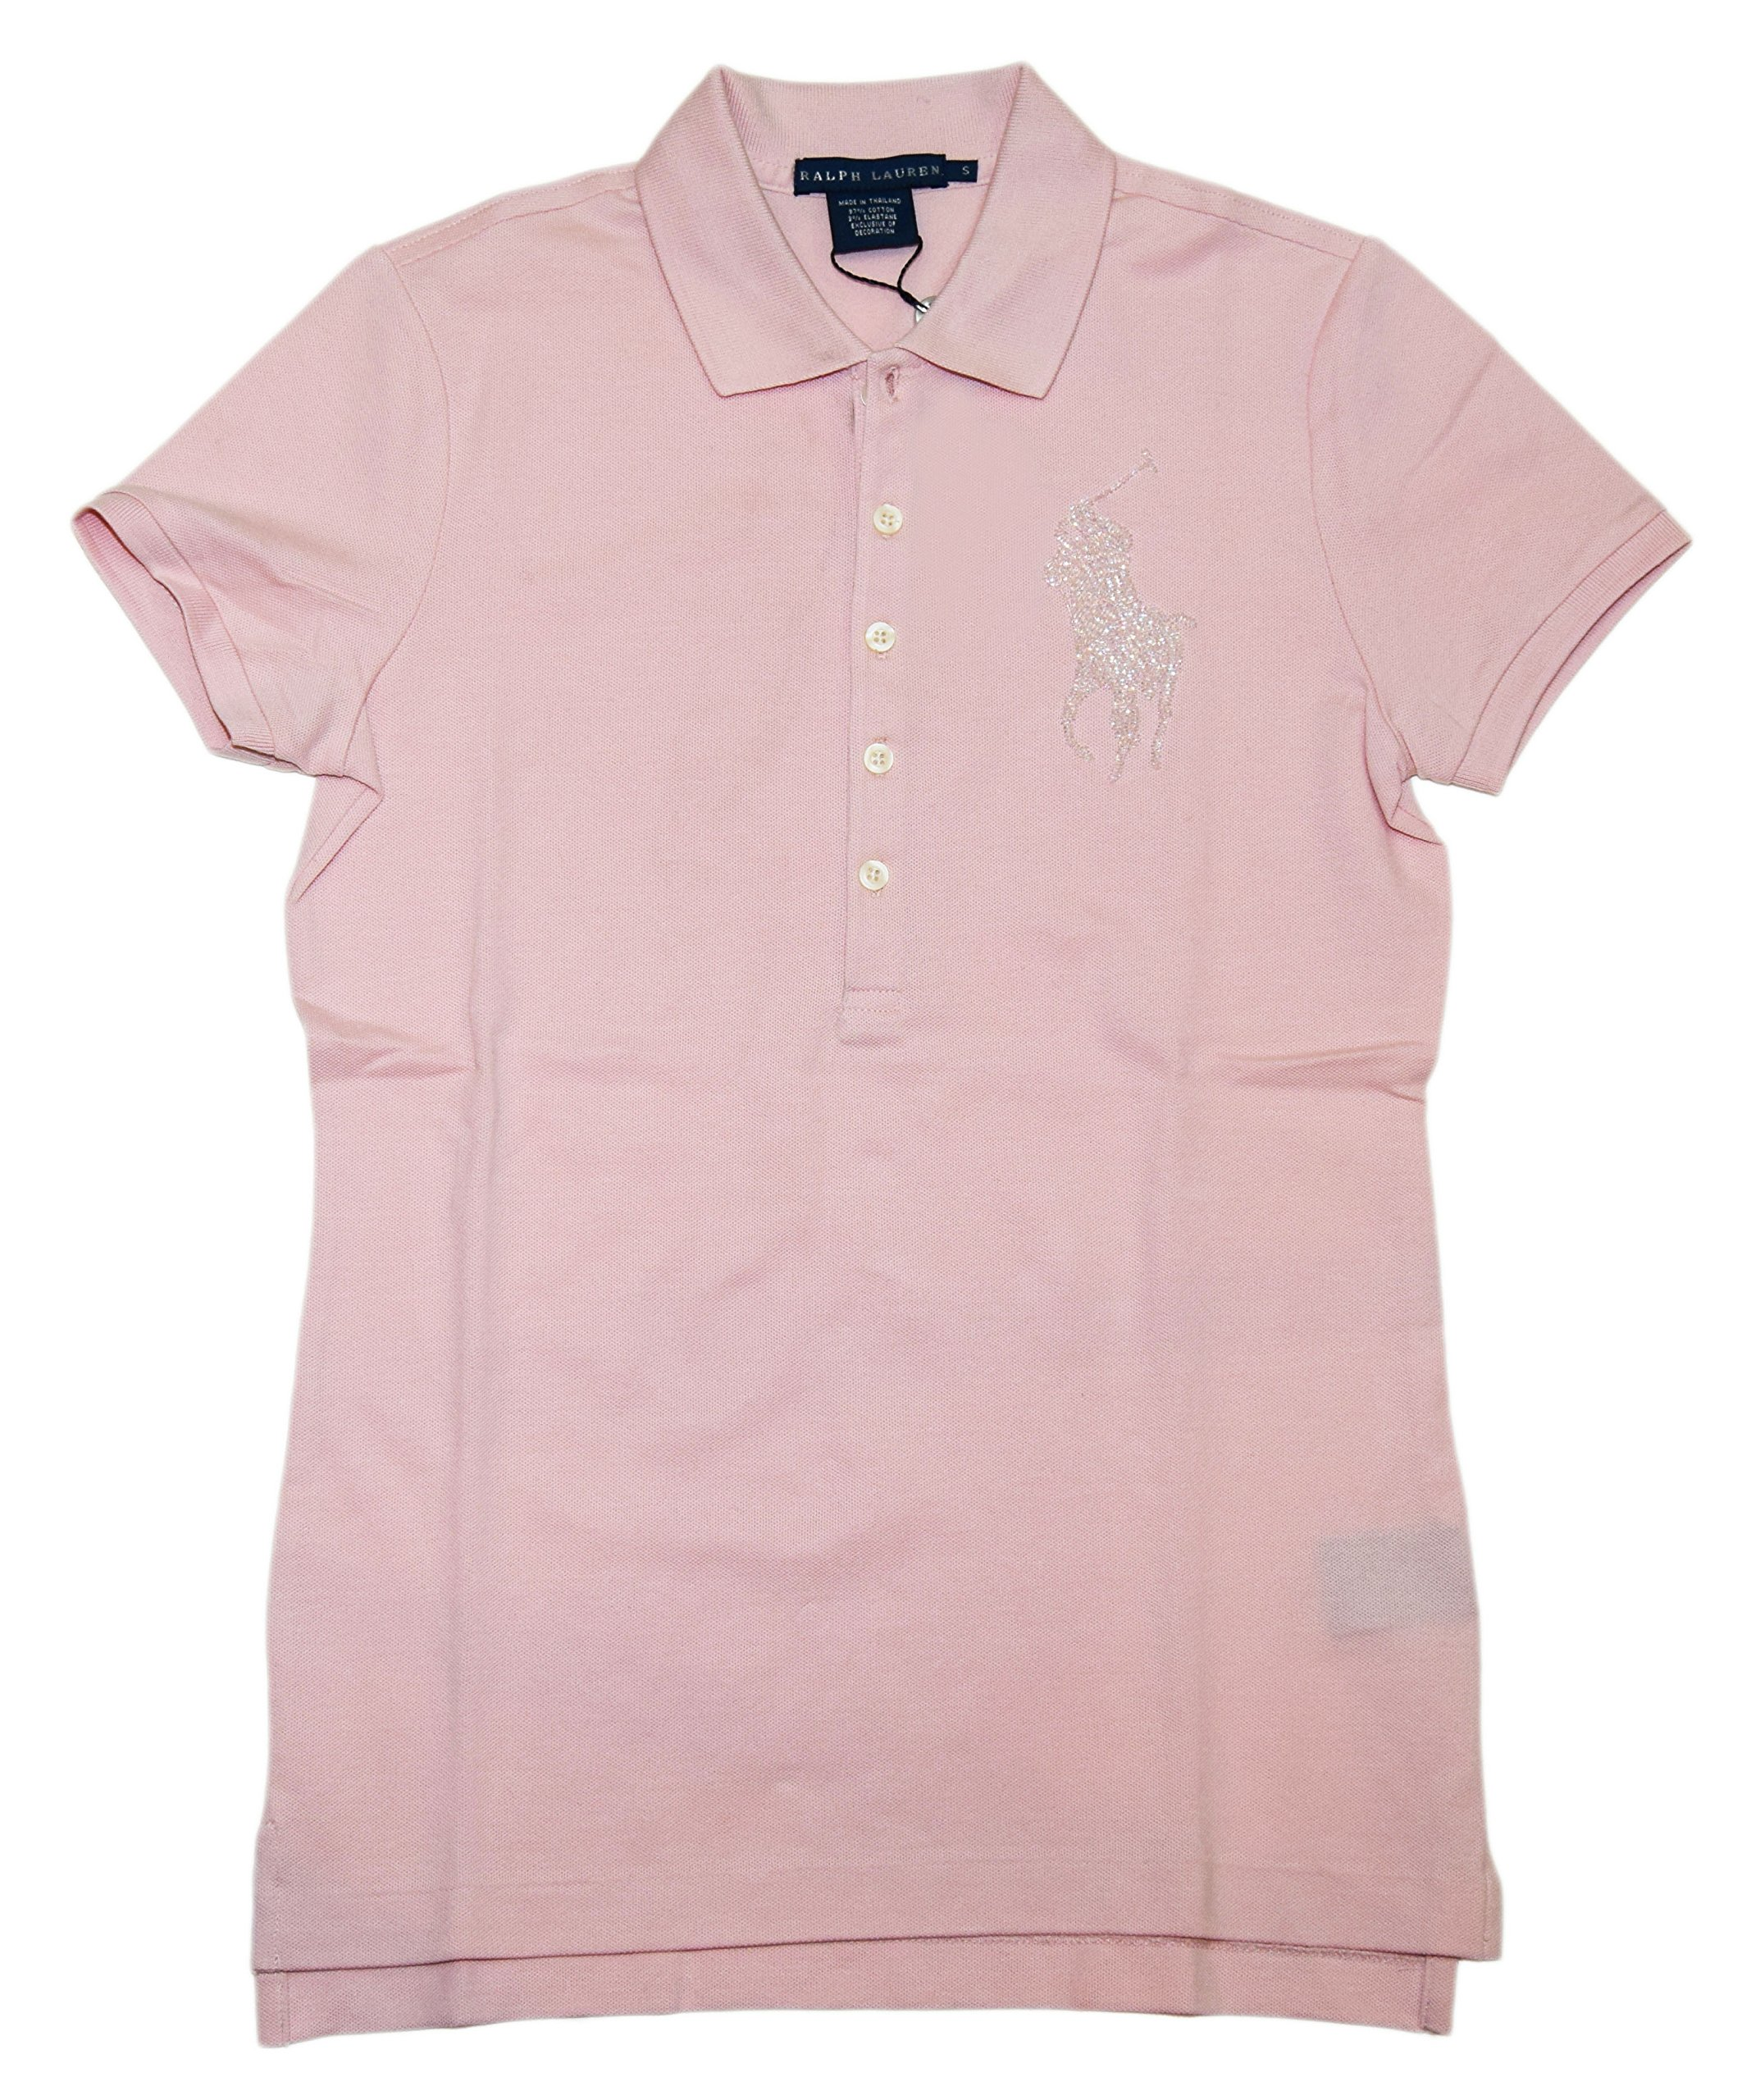 Polo Ralph Lauren Womens Big Pony Beaded Short Sleeve Mesh Shirt Pink Small